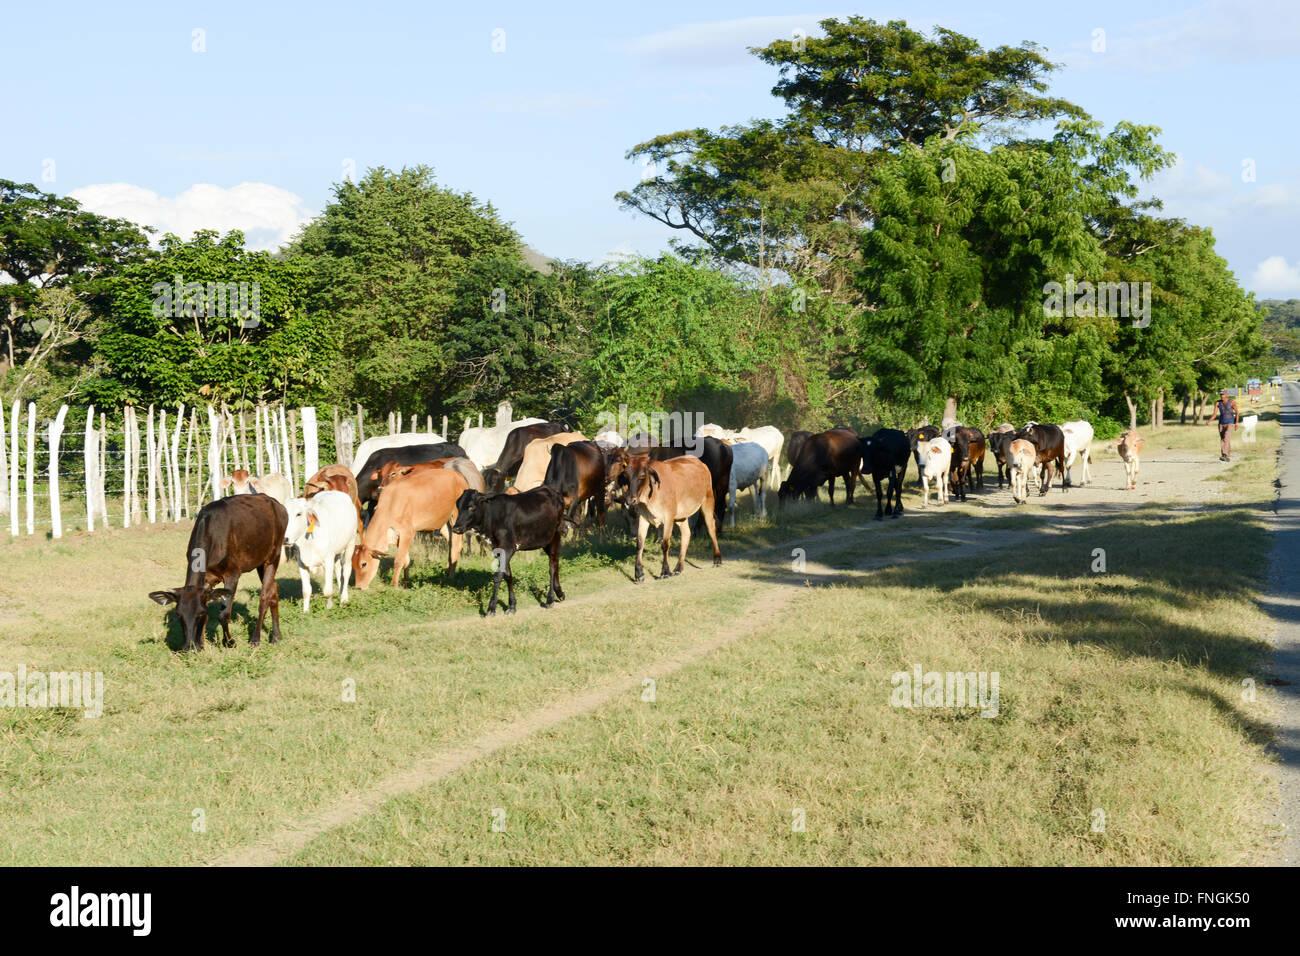 Santiago De Cuba, Kuba - 14. Januar 2016: Bauer führt seine Herde der Kühe in der Nähe von Santiago Stockbild